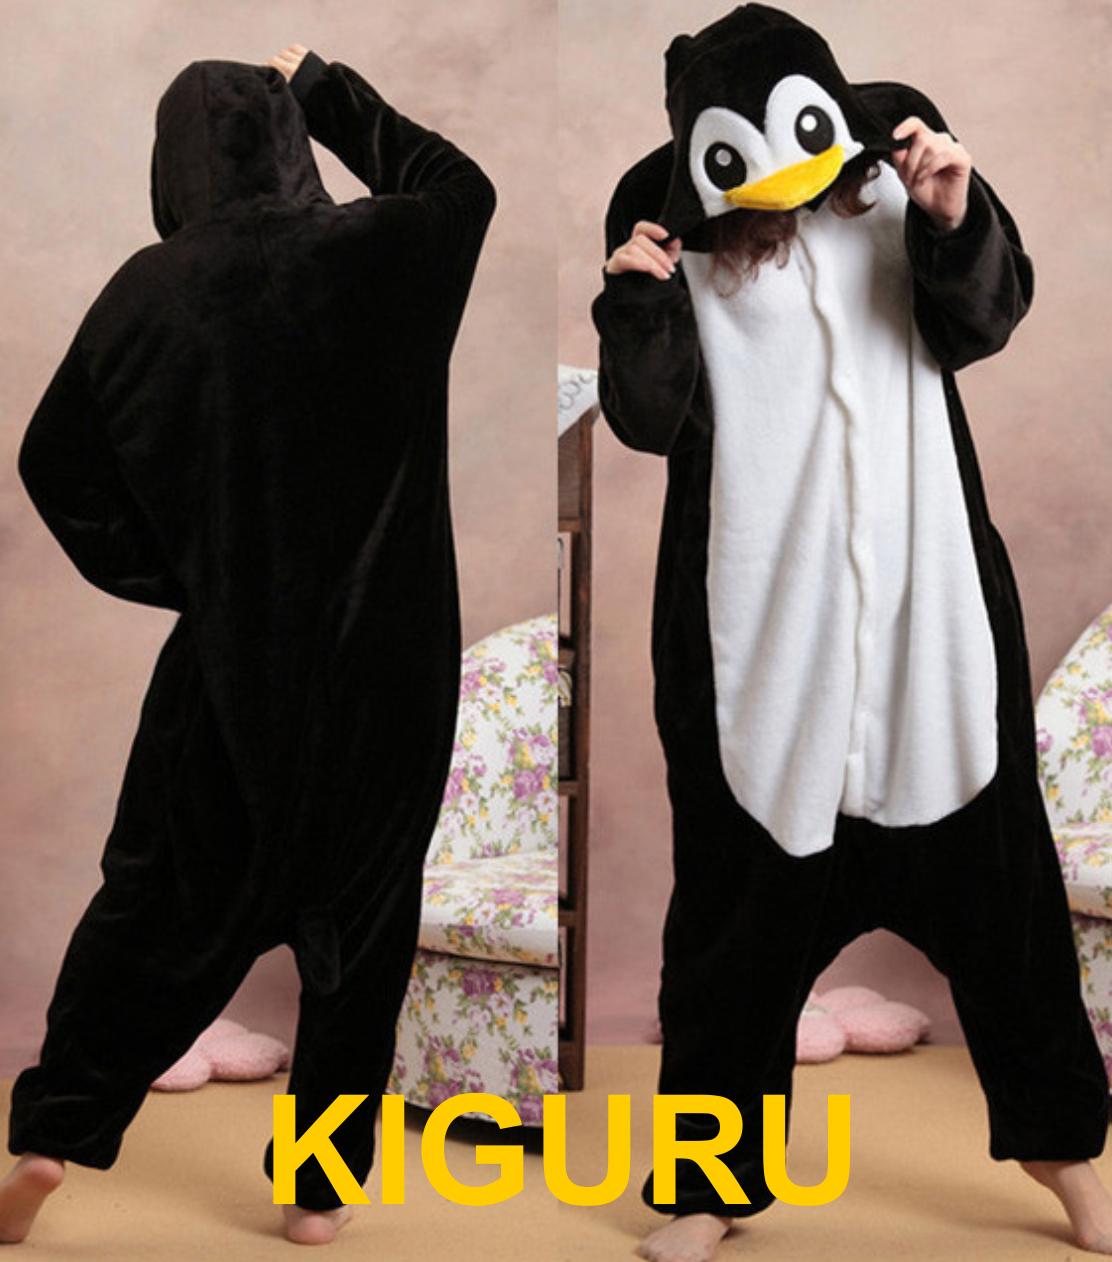 Костюм кигуруми пижама пингвин - KIGURU в Киеве